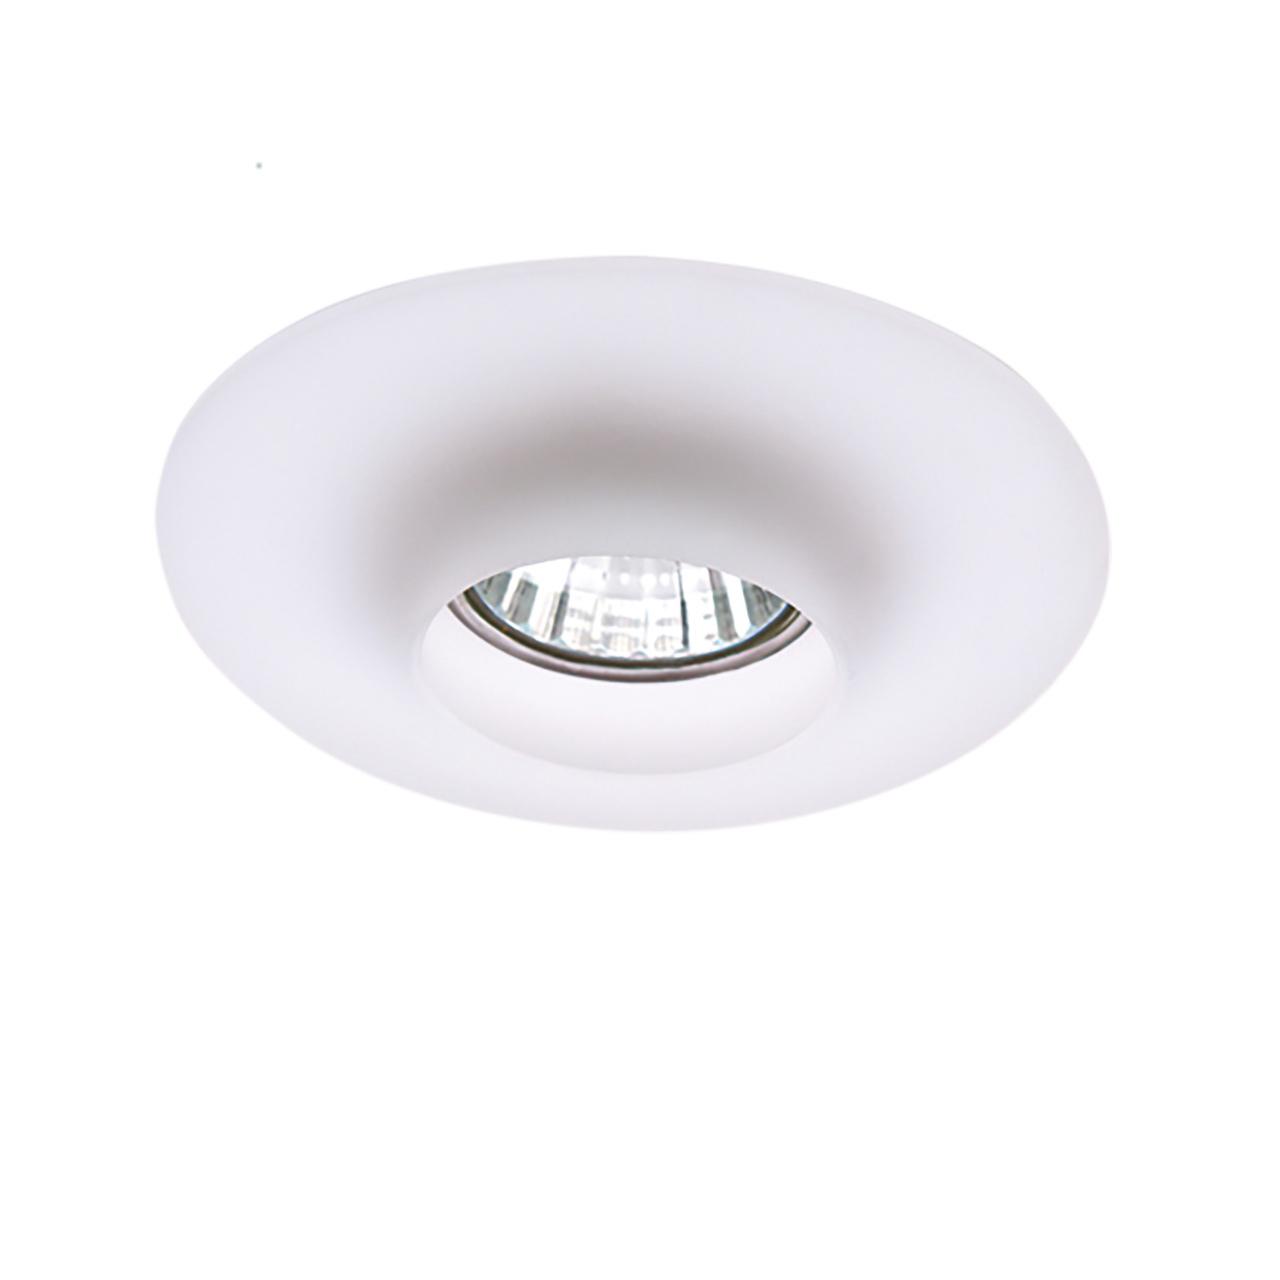 Светильник Fritella MR16 хром / белый Lightstar 002700